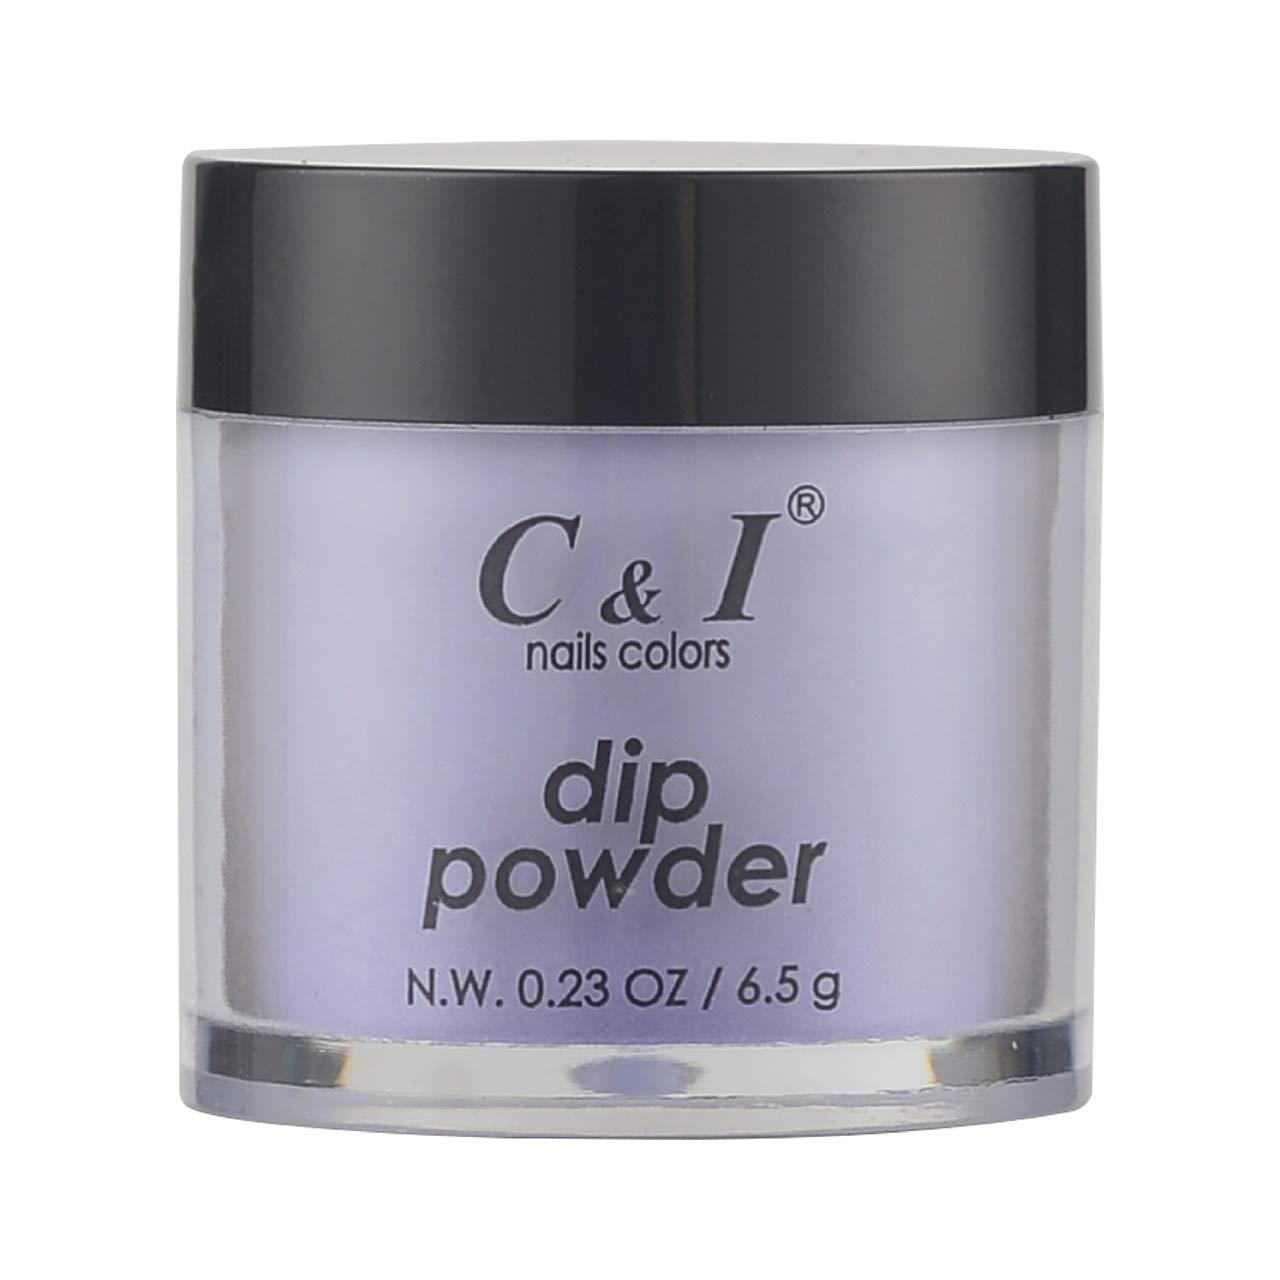 C & I Dipping Powder, Nail Colors, Gel Effect, Color # 60 Bluish Violet, 0.23 oz, 6.5 g, Purple Color System (1 pc)